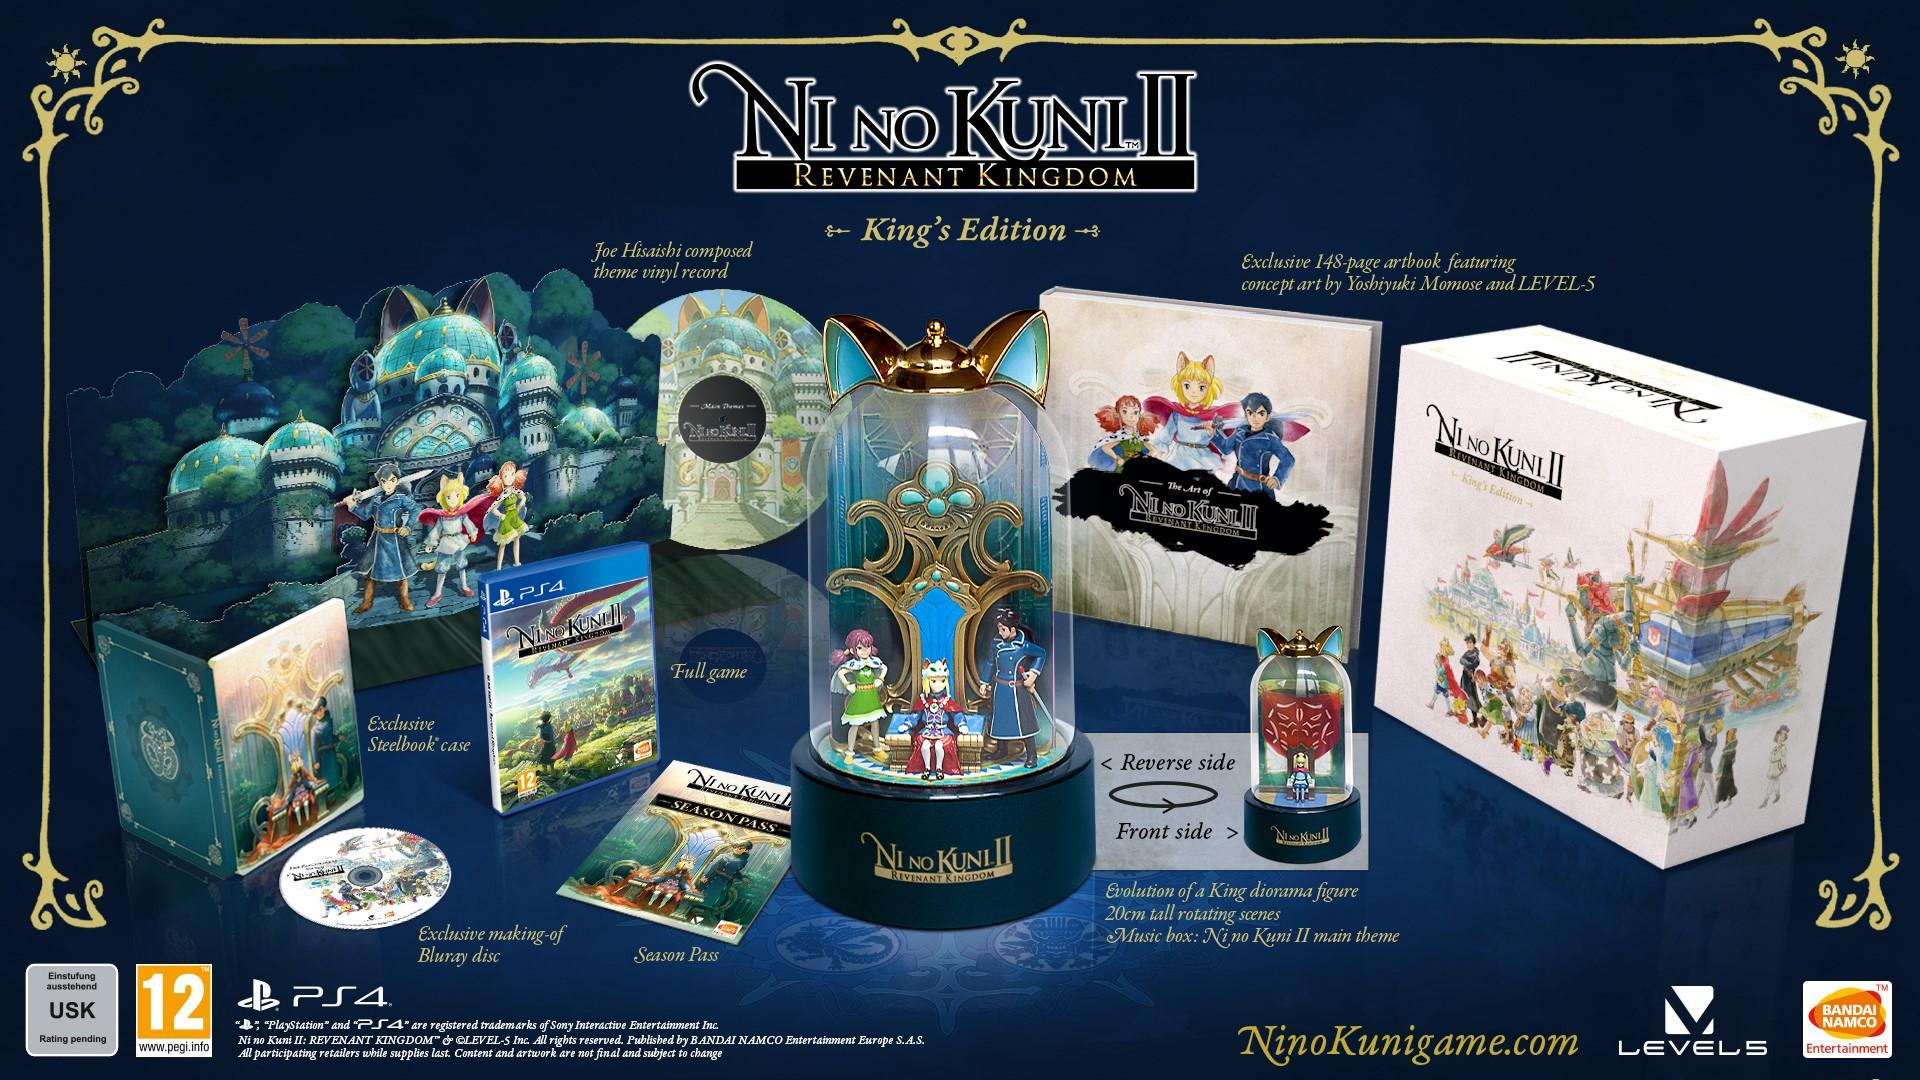 [2018-01-19] Ni no kuni 2 revenant kingdom - PS4 - PC 1502202851-8079-artwork